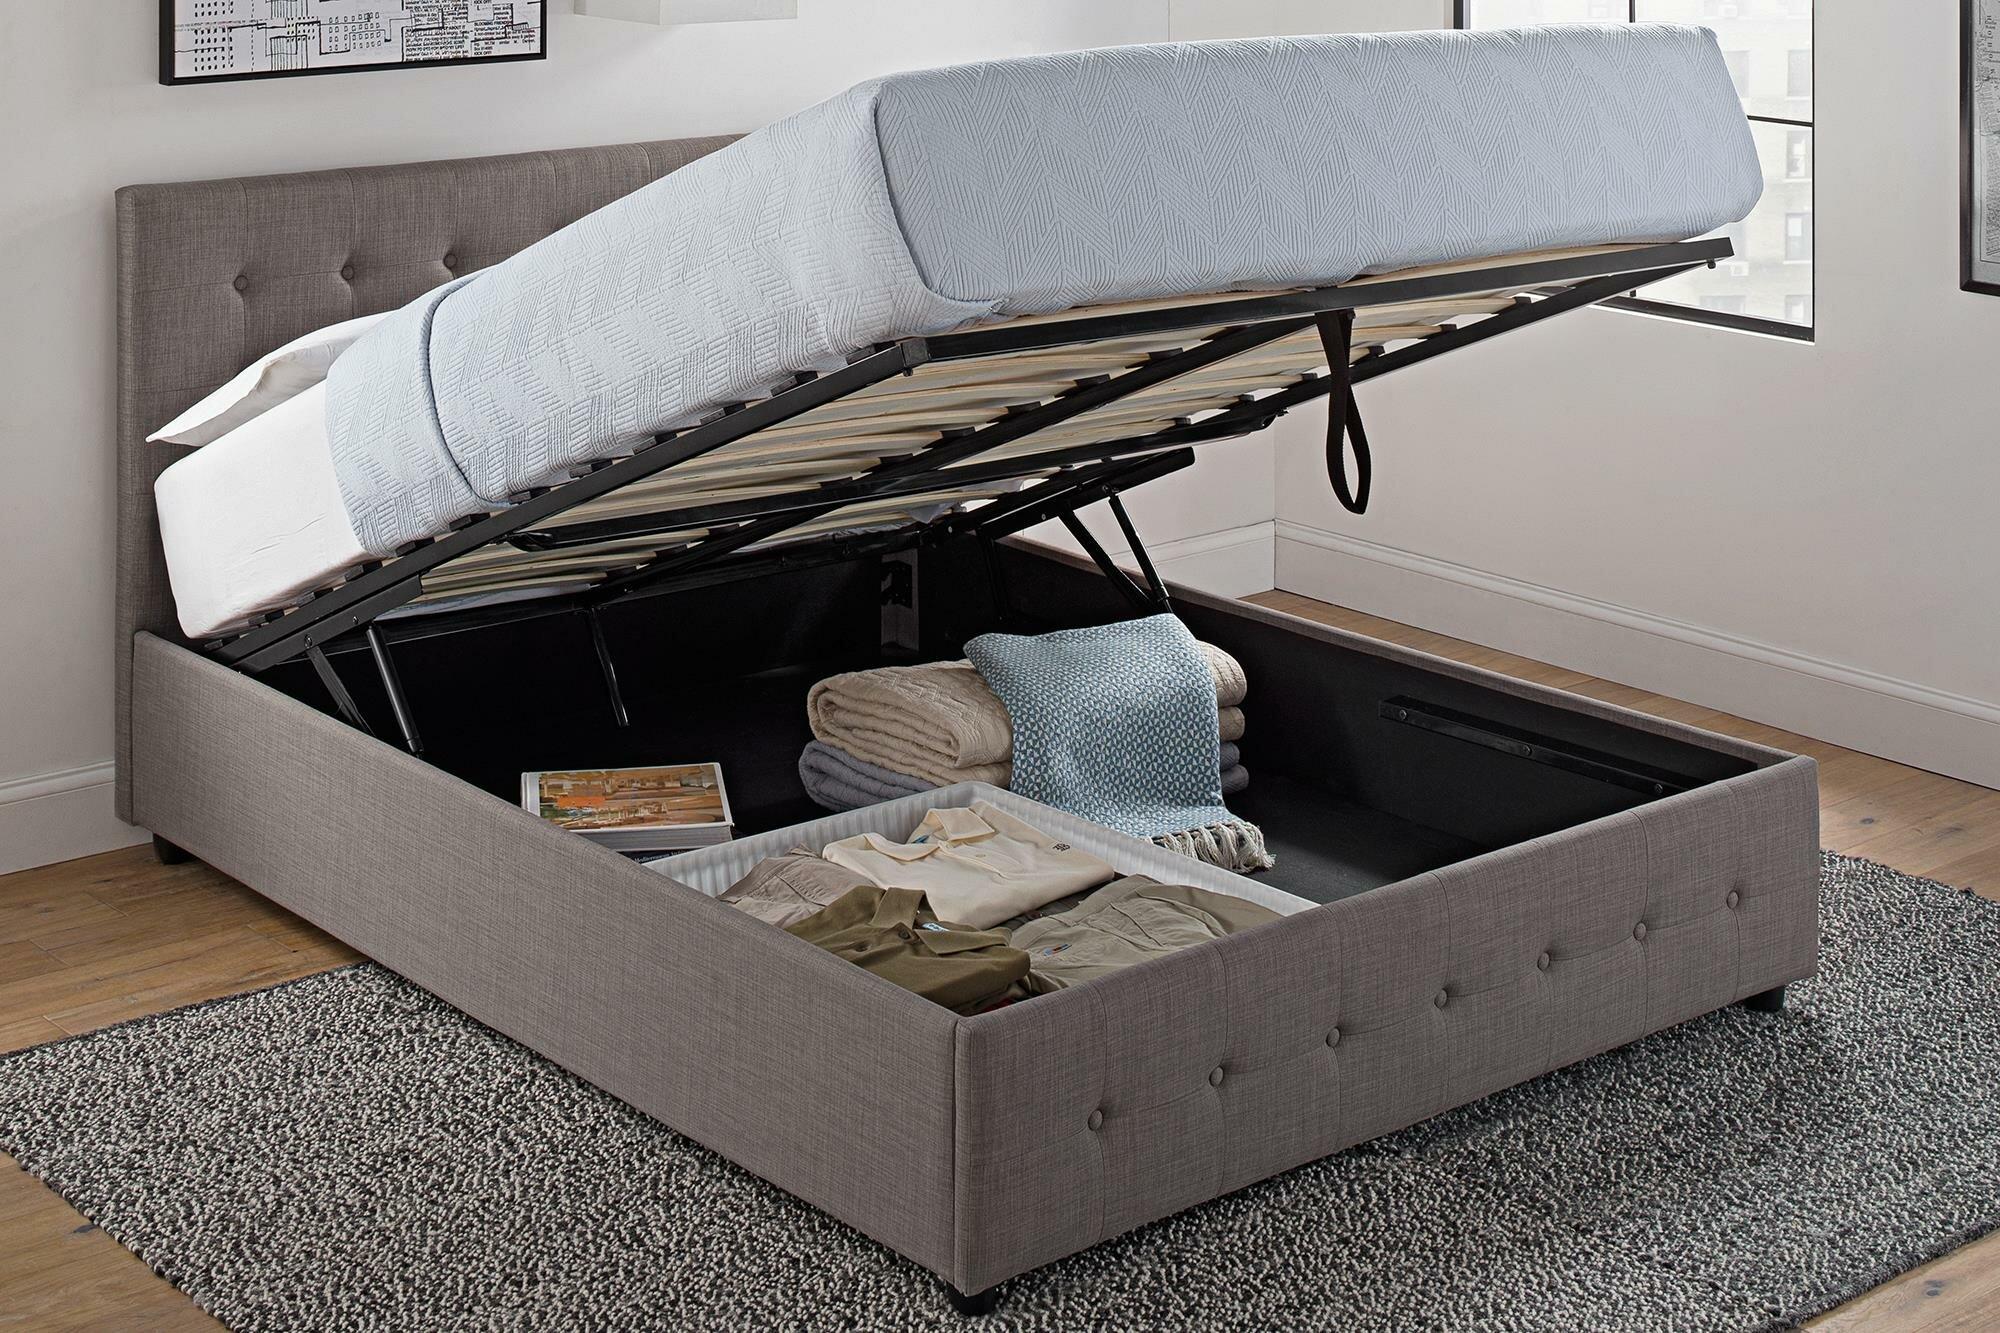 Morphis Upholstered Storage Platform